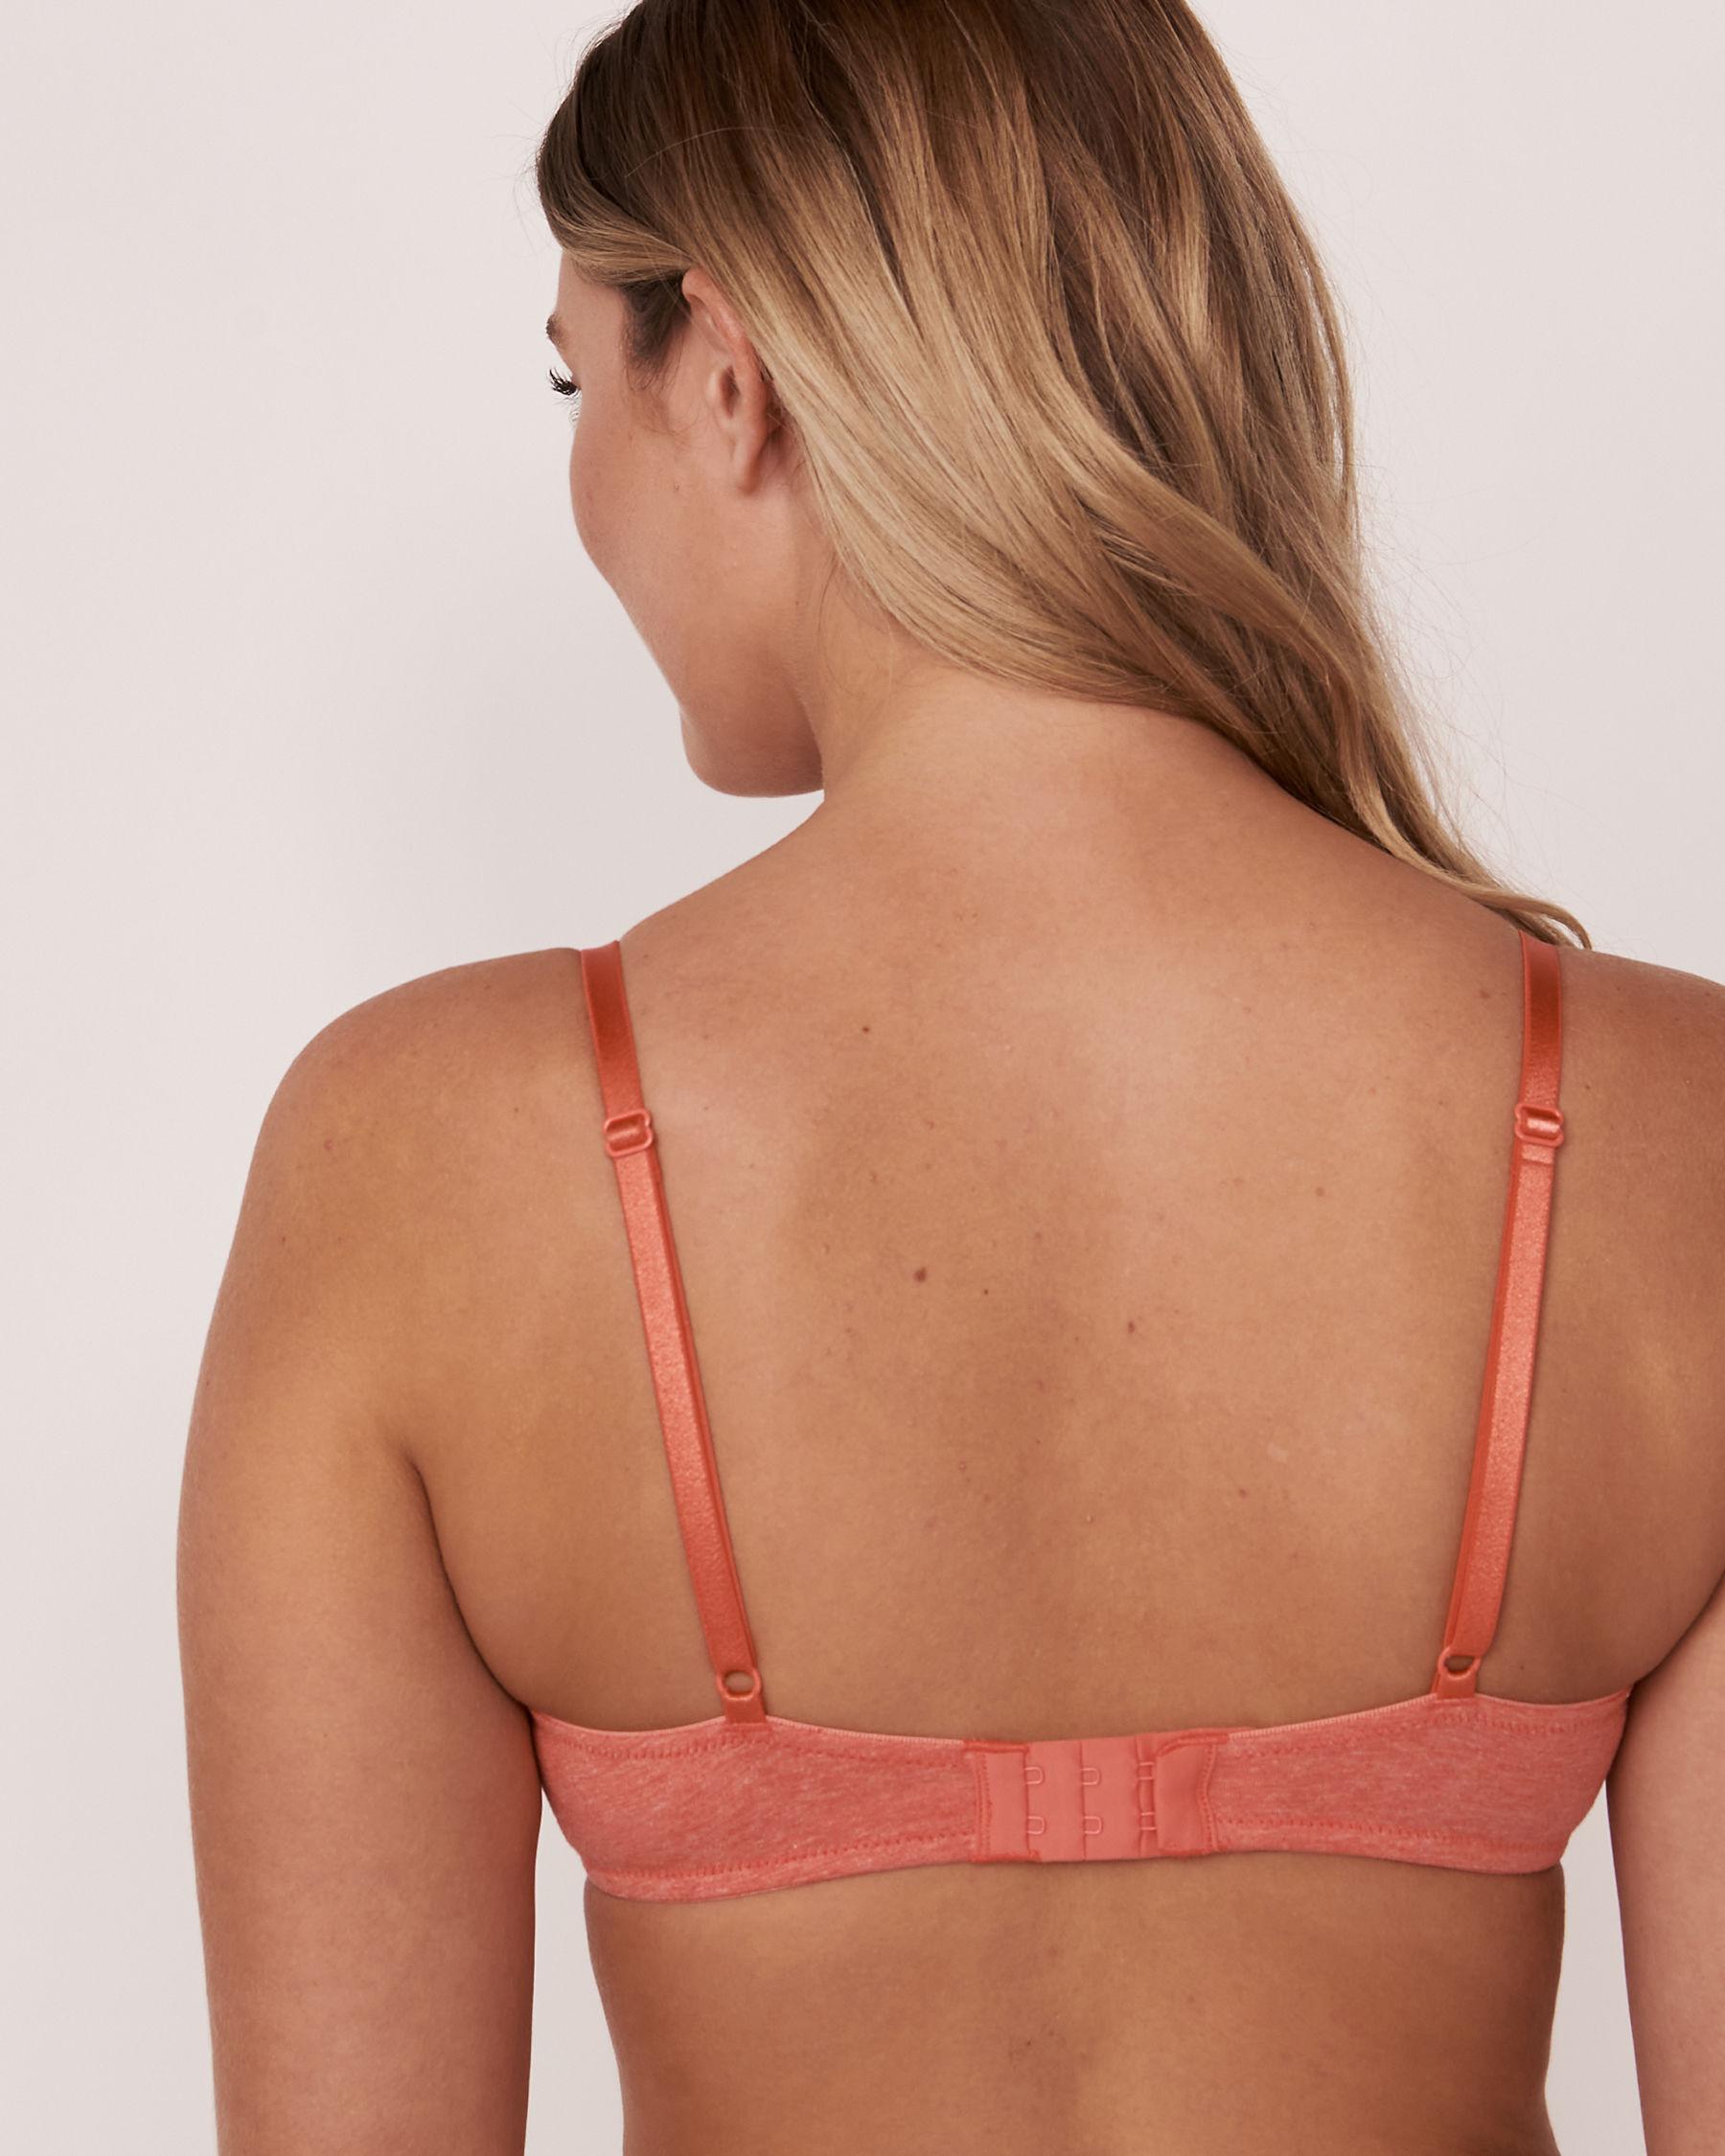 LA VIE EN ROSE Lightly Lined Demi Cotton Bra Pink mix 10200012 - View2